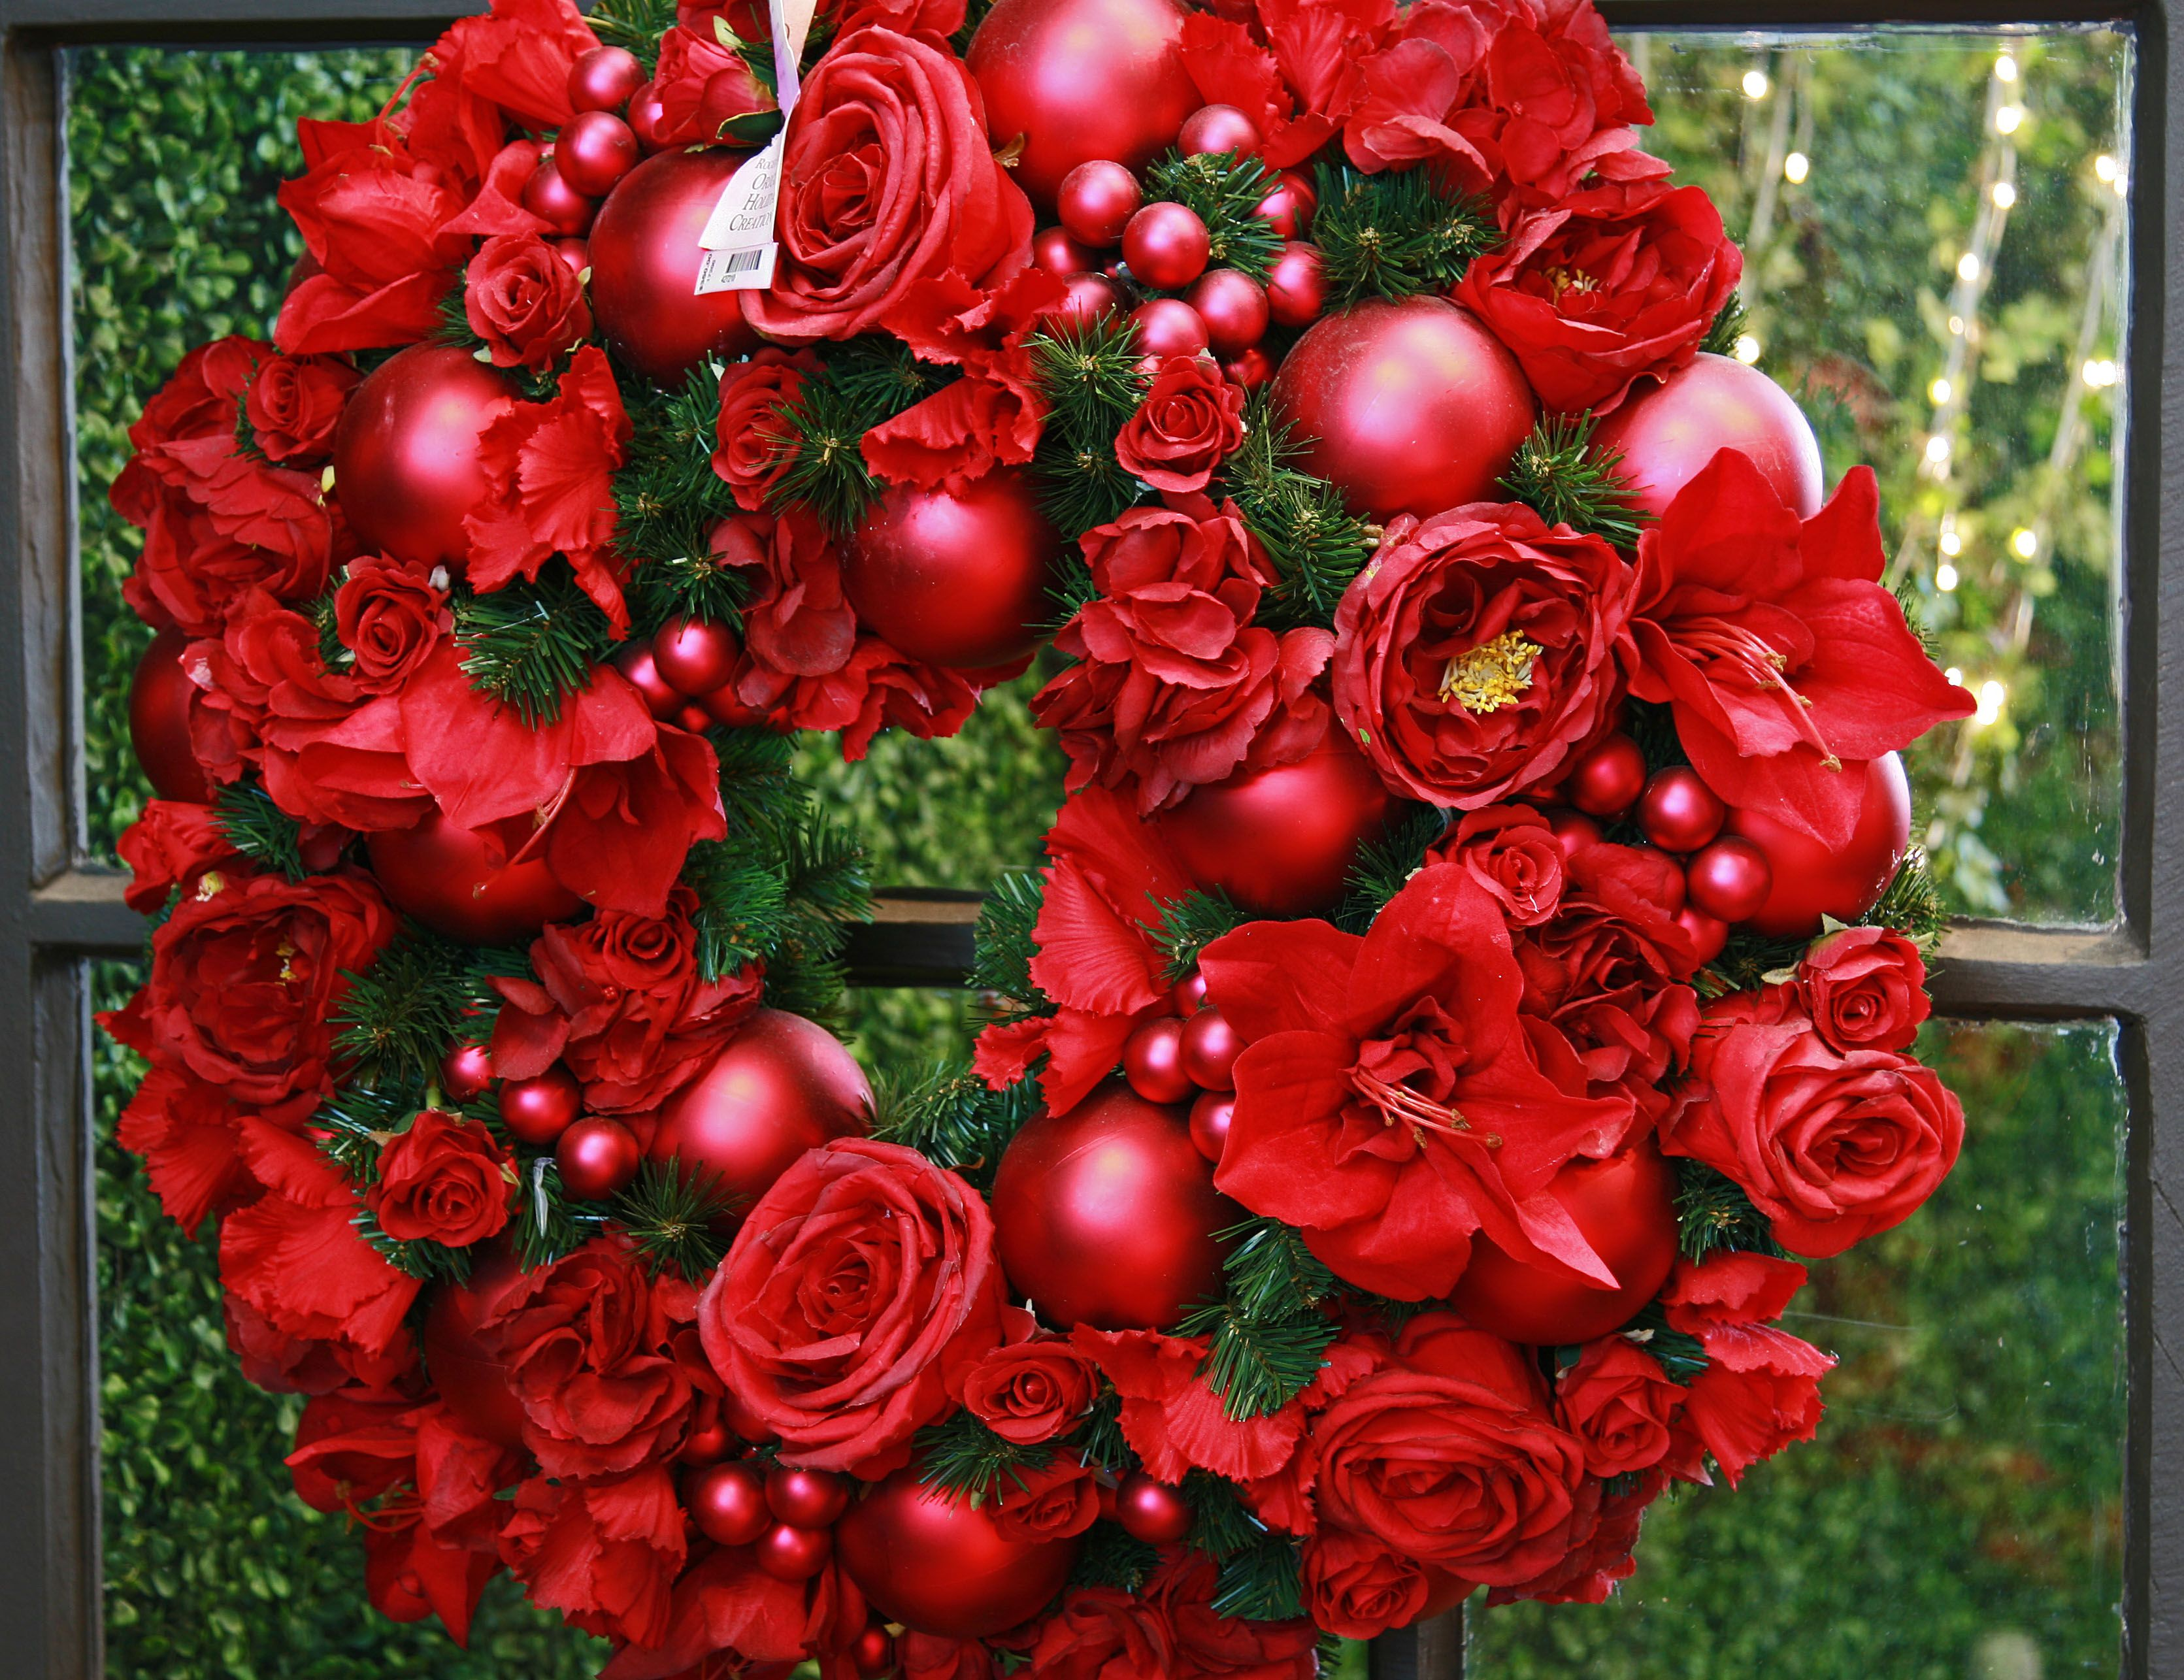 Rogers Gardens Christmas tree shops red wreath Christmas